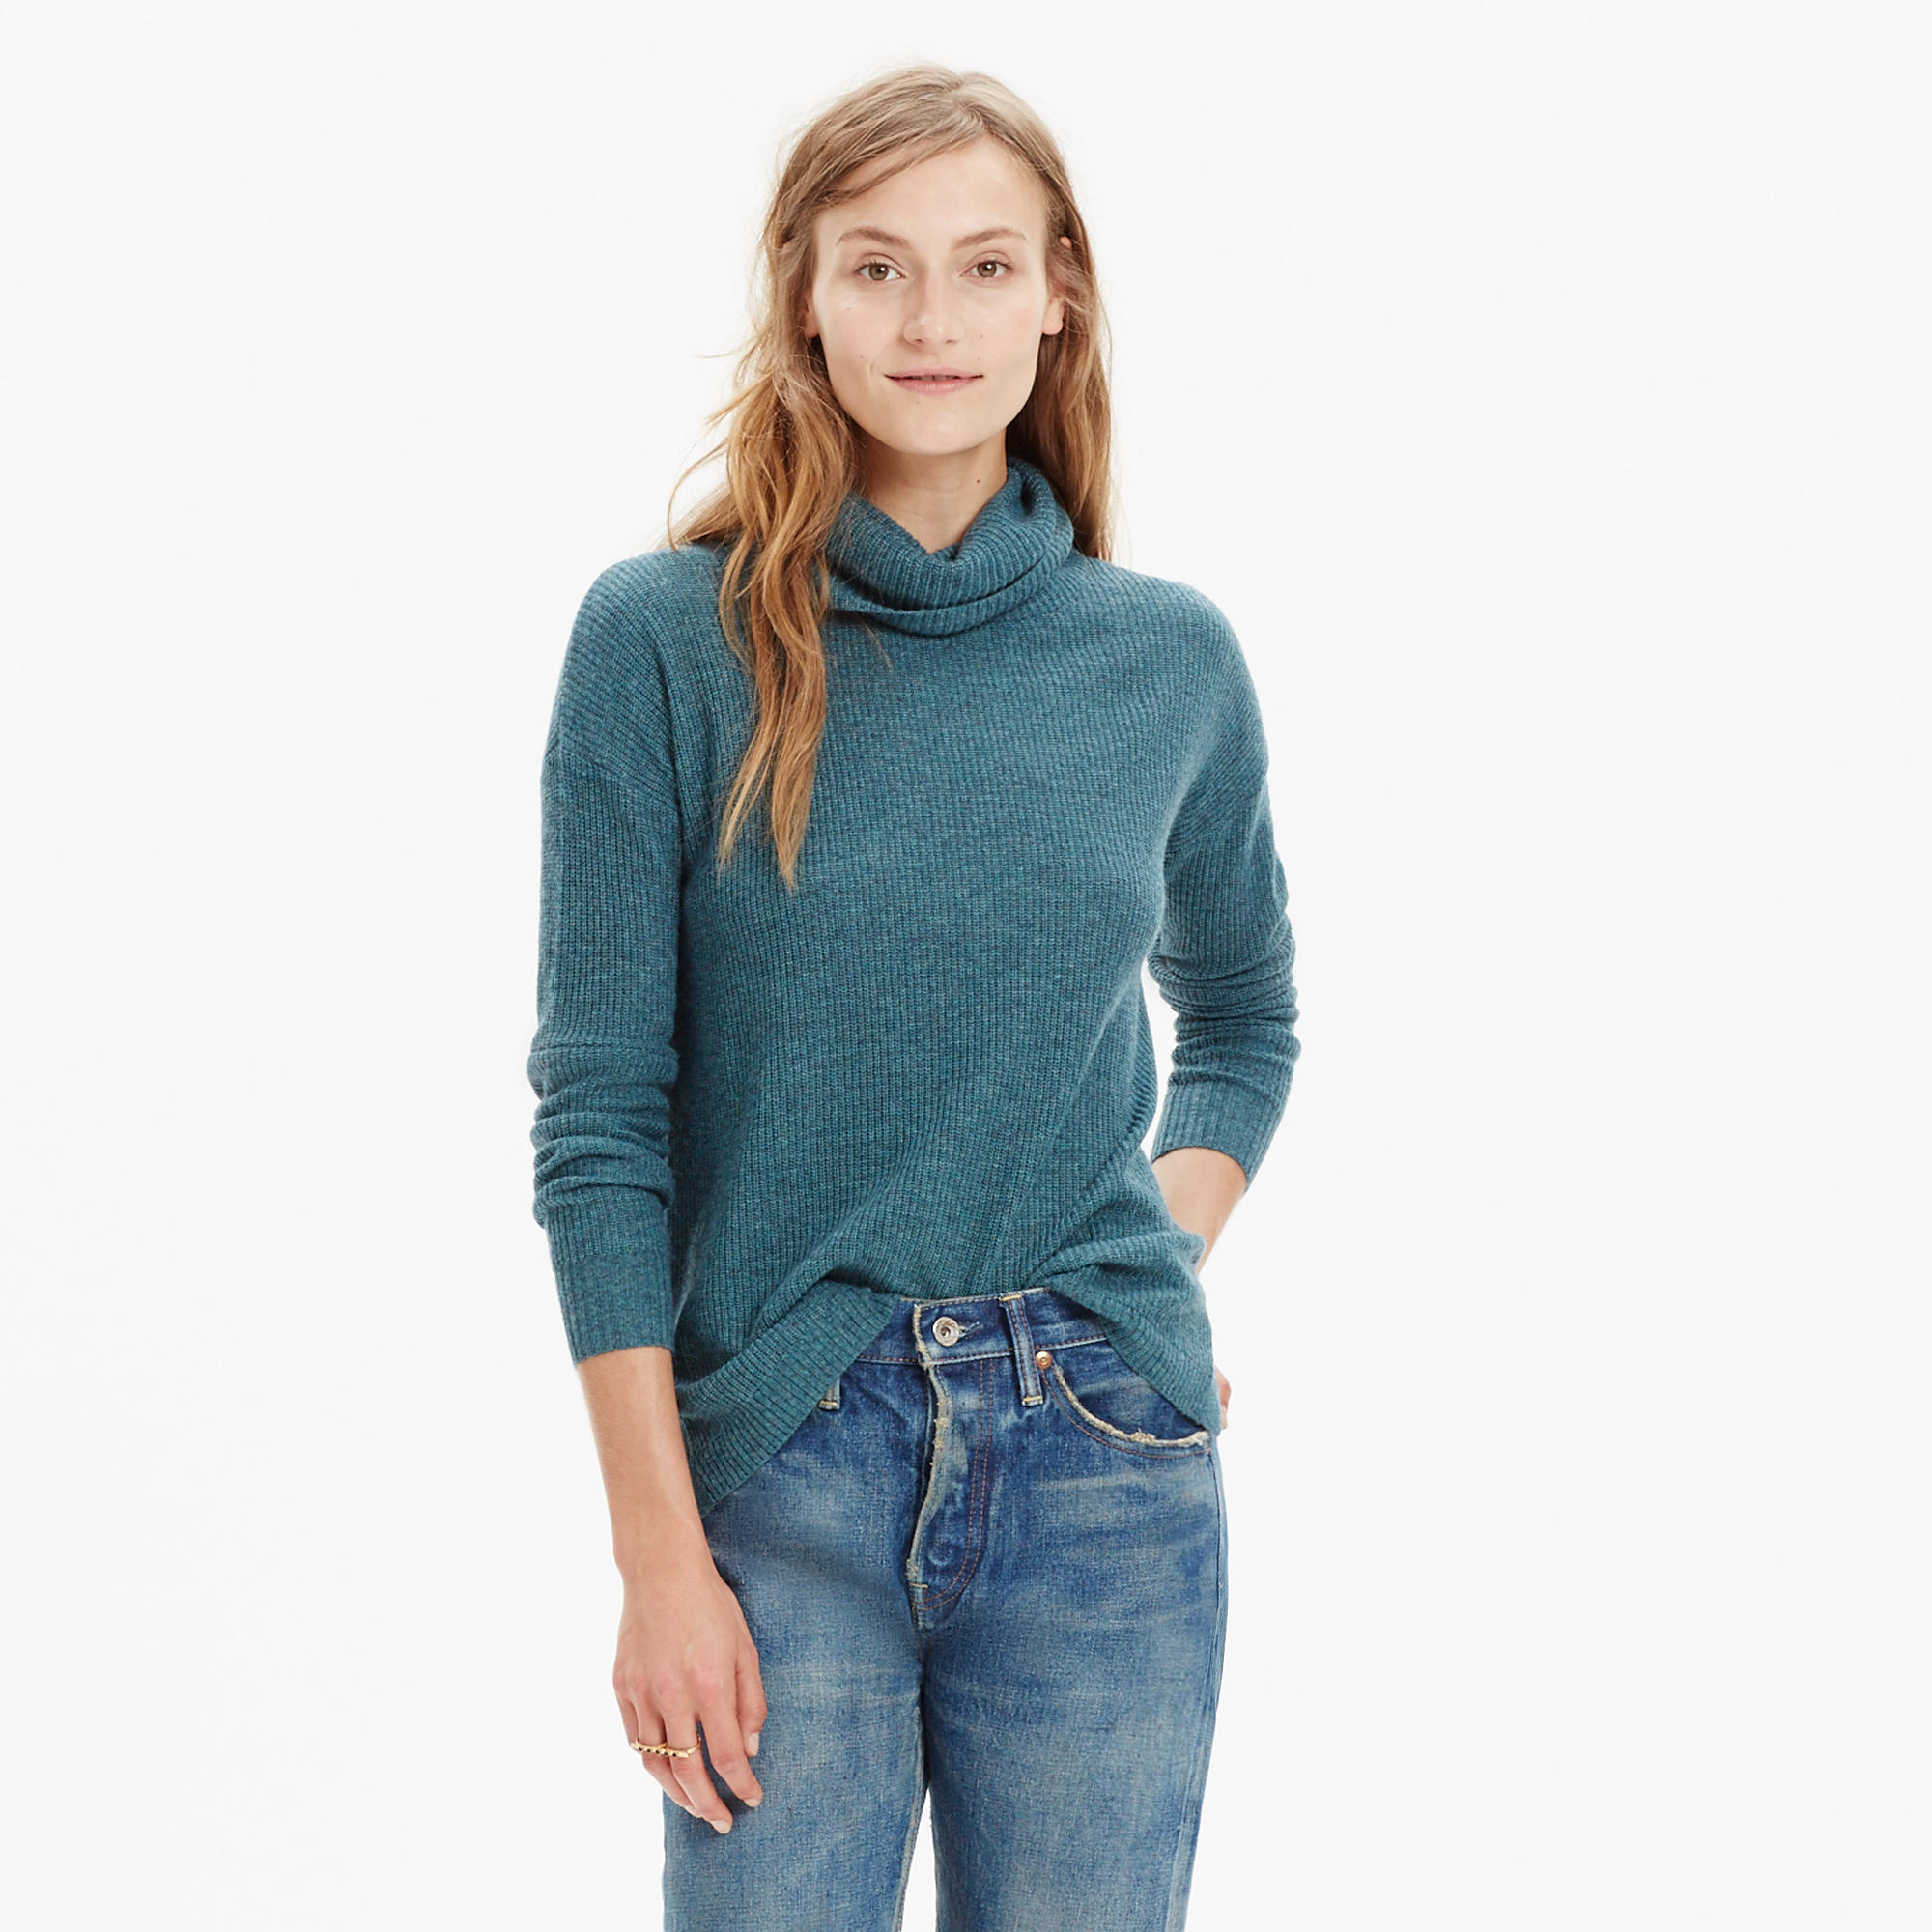 Ribbed Turtleneck Sweater : turtlenecks | Madewell